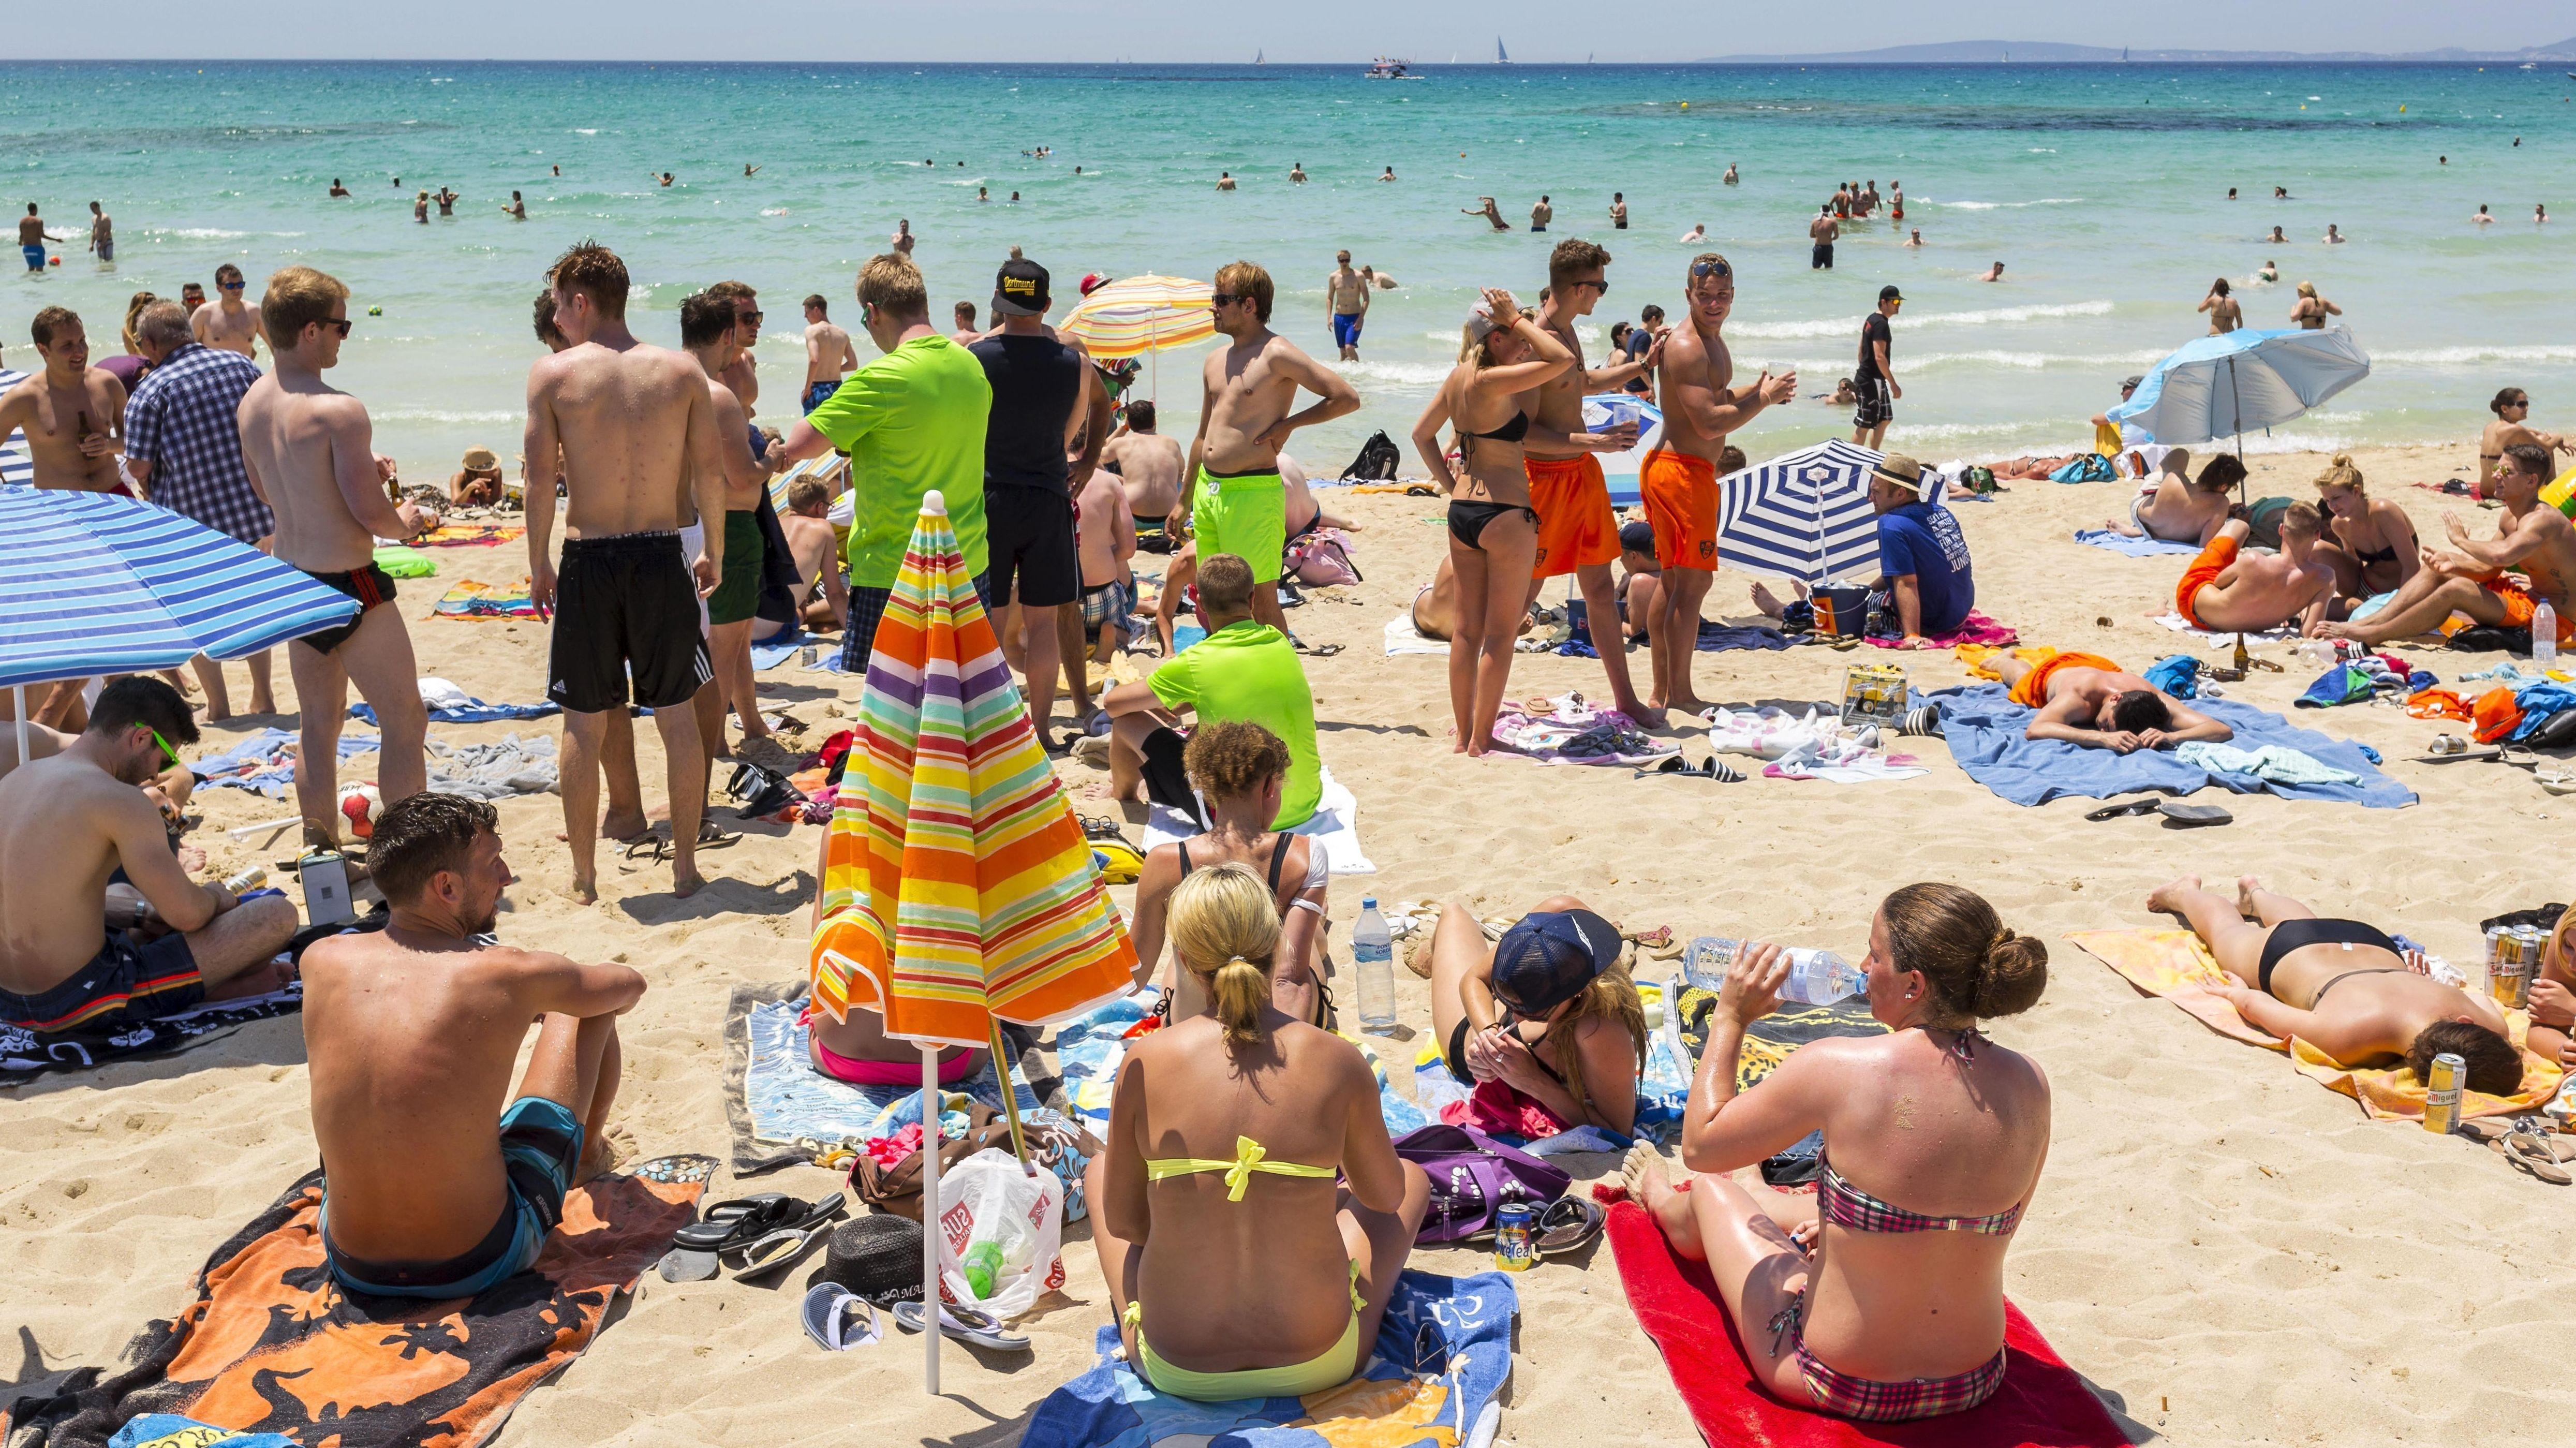 Ballermann-Strand auf Mallorca